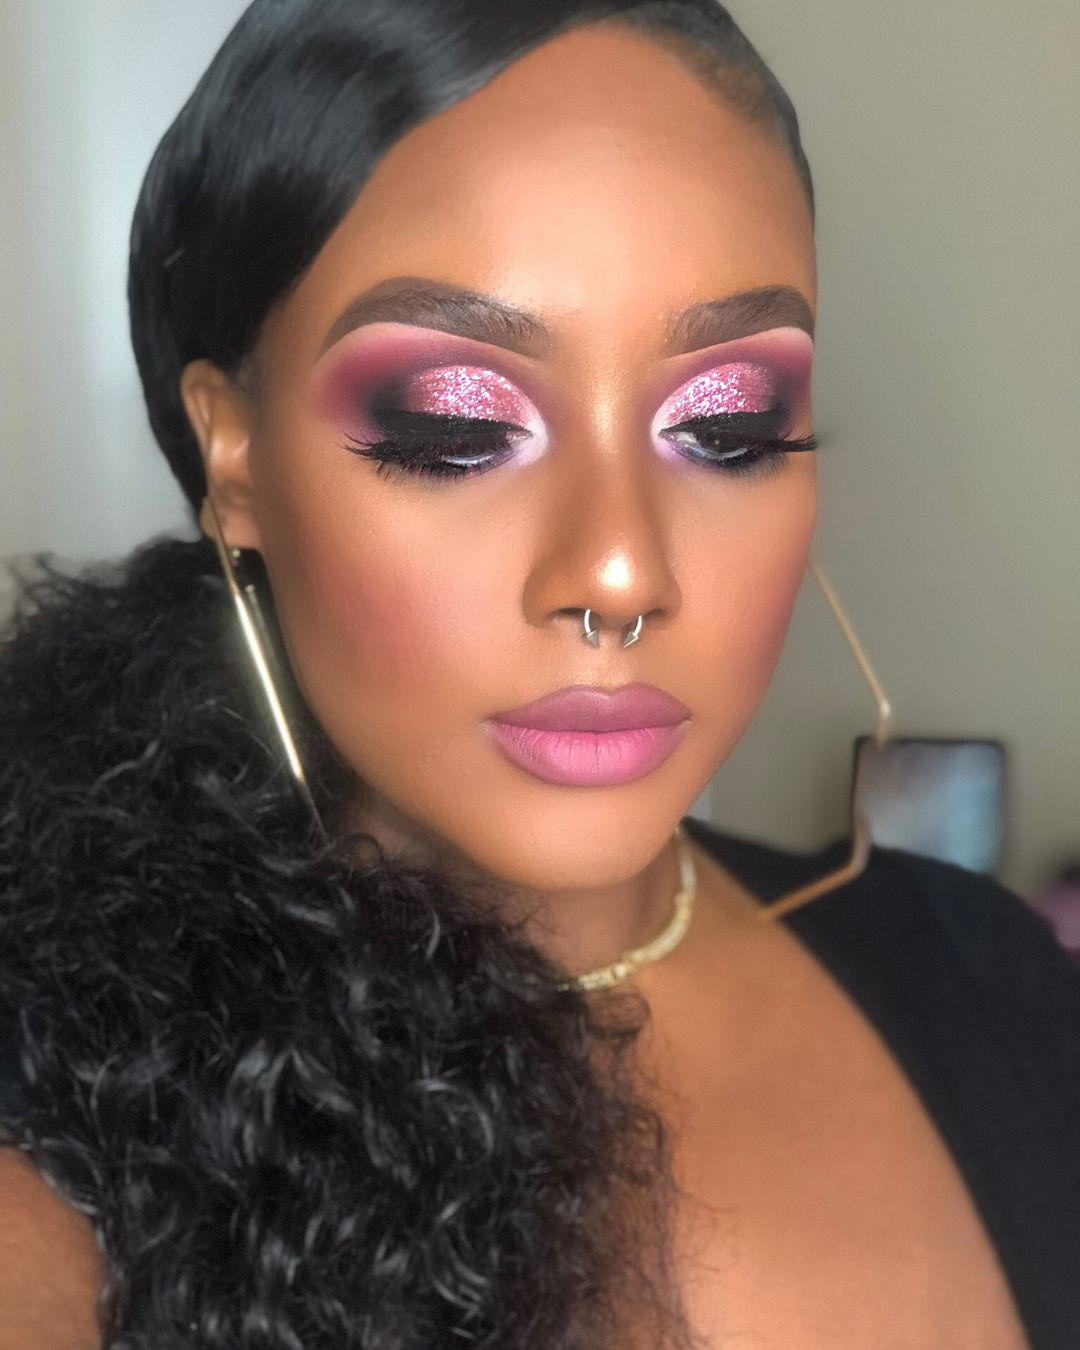 Las vegas makeup artist on instagram you could never go